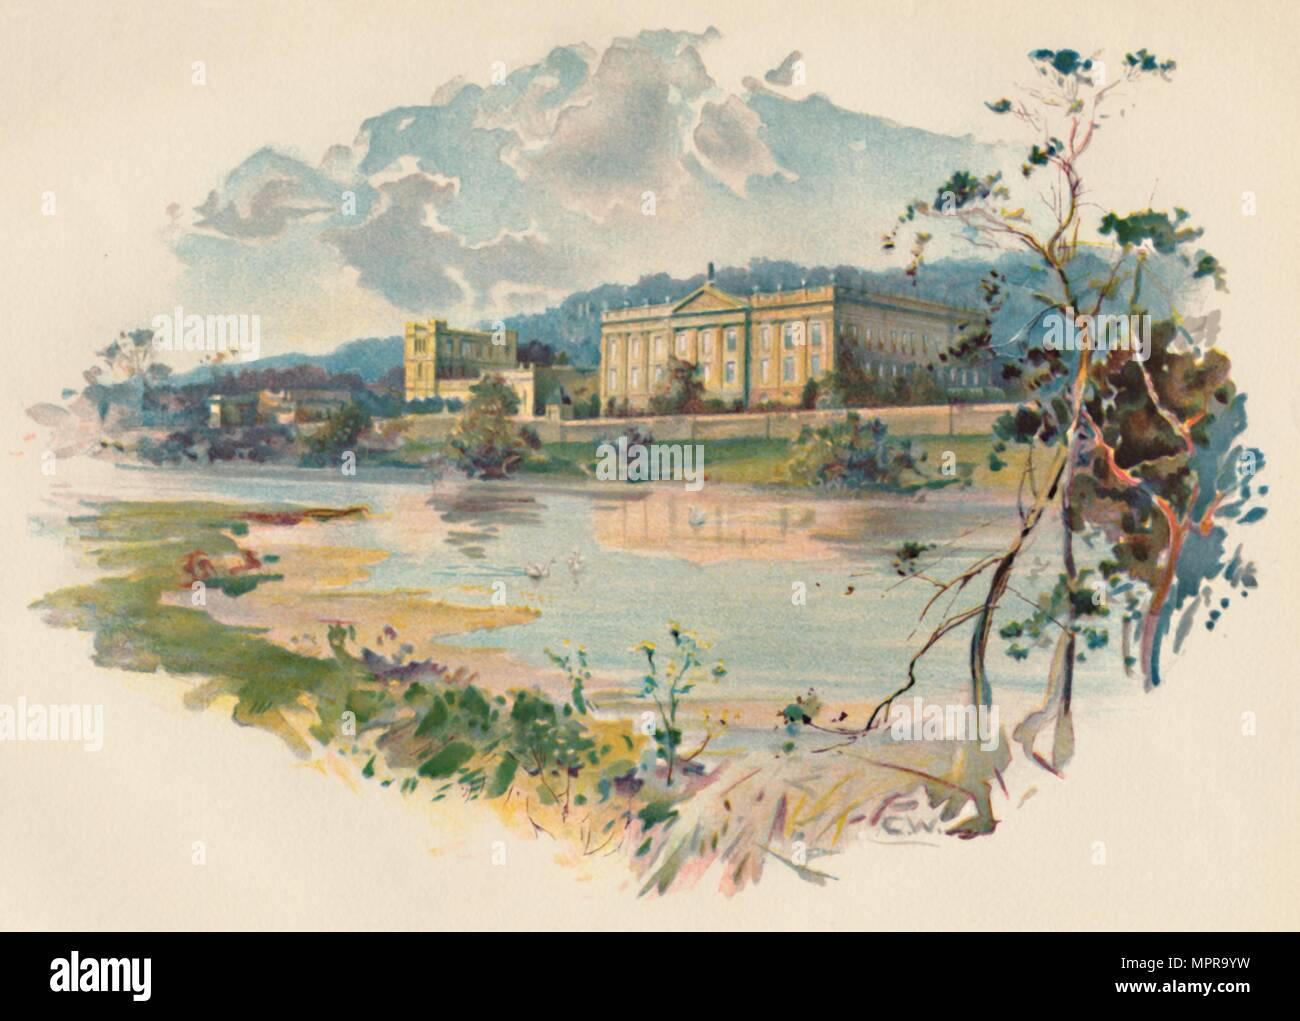 'Chatsworth from the Derwent', c1890. Artist: Charles Wilkinson. - Stock Image